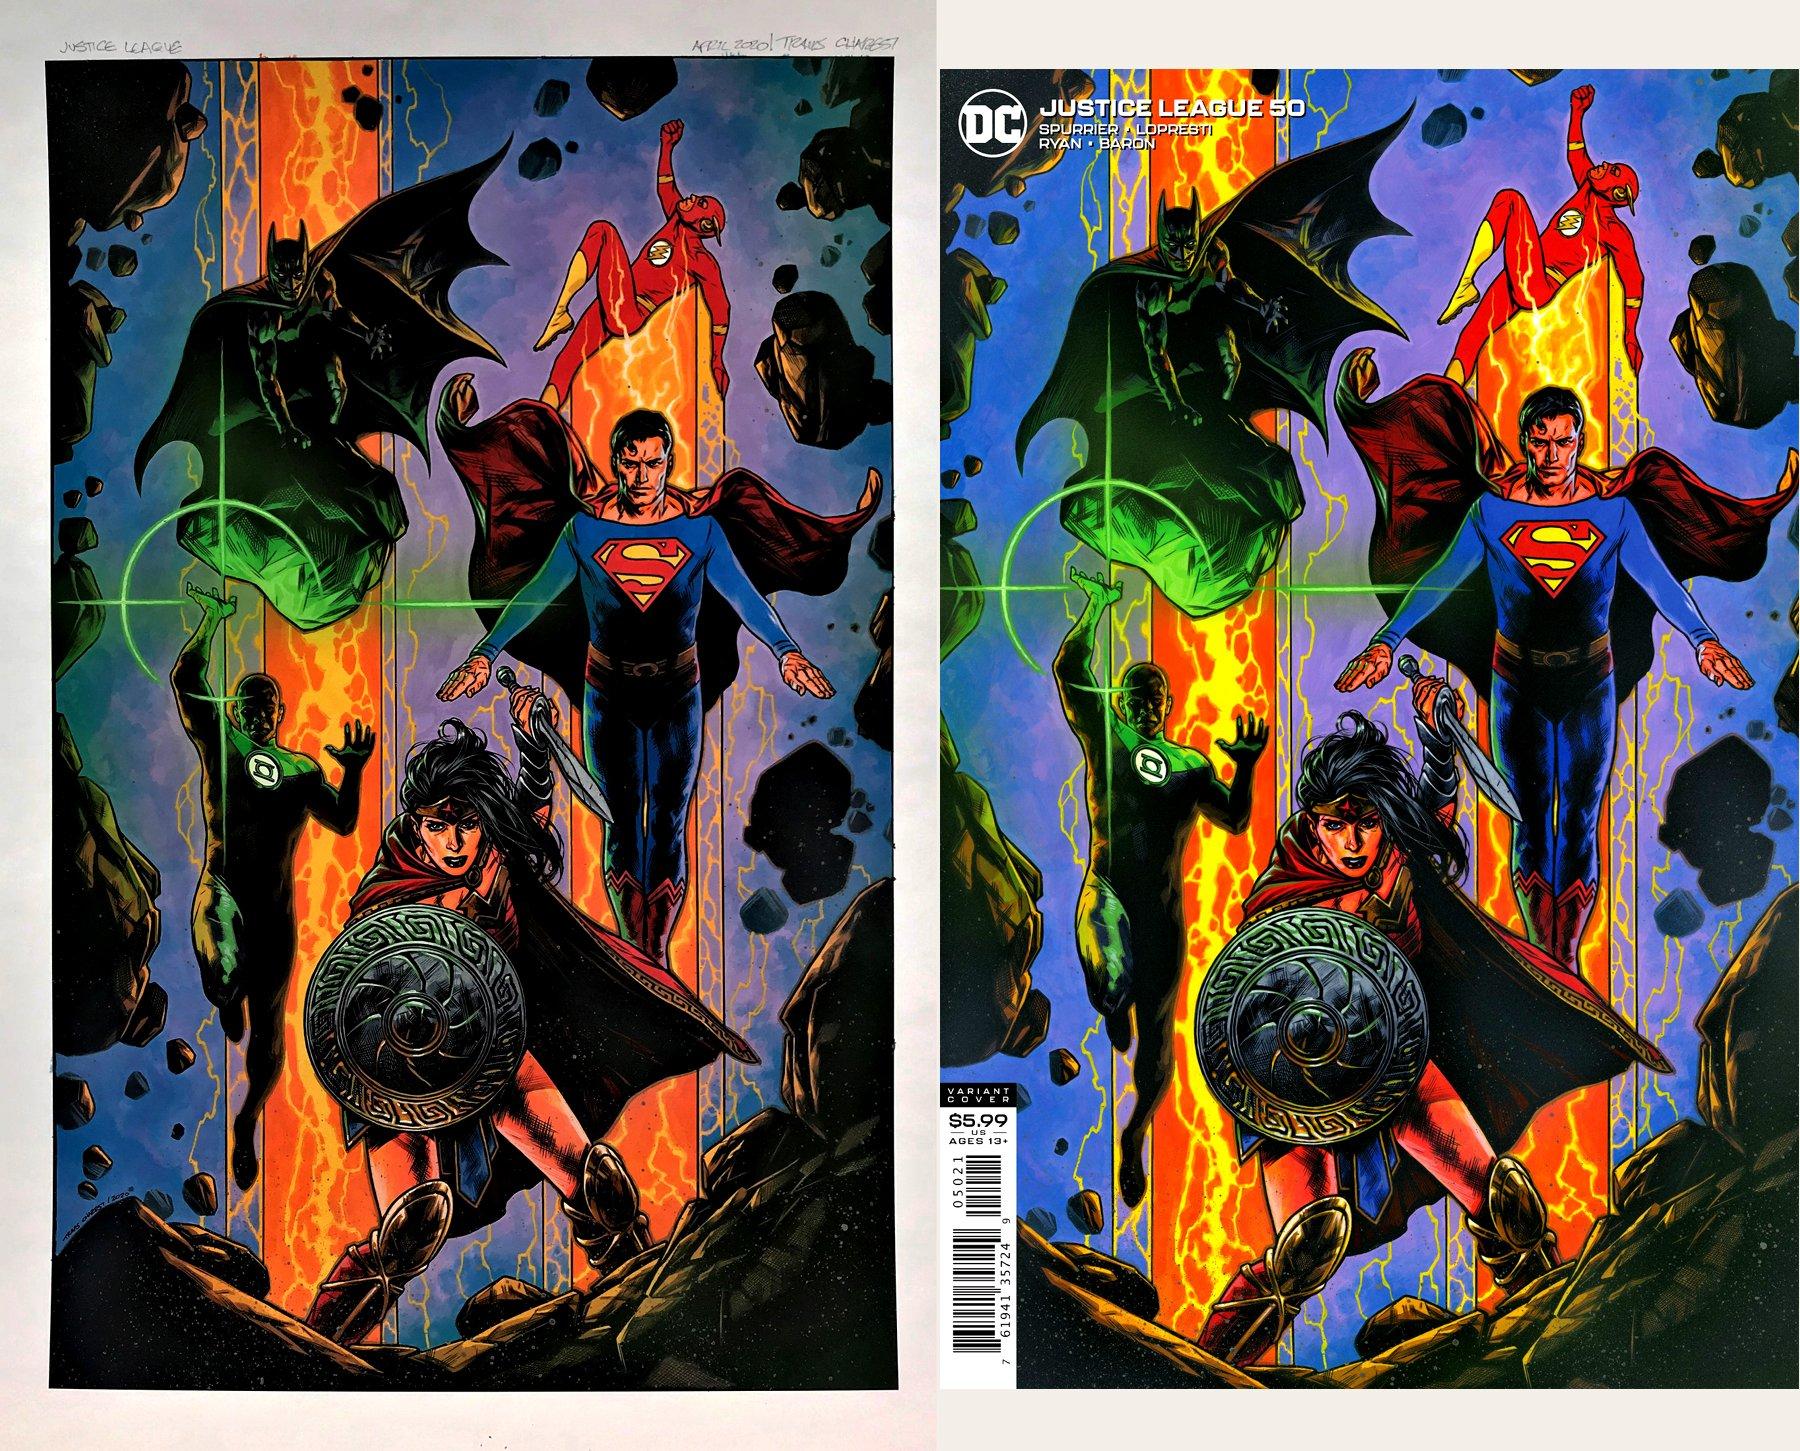 Justice League #50 Large Painted Cover (Wonder Woman, Green Lantern, Batman, Superman, Flash!)